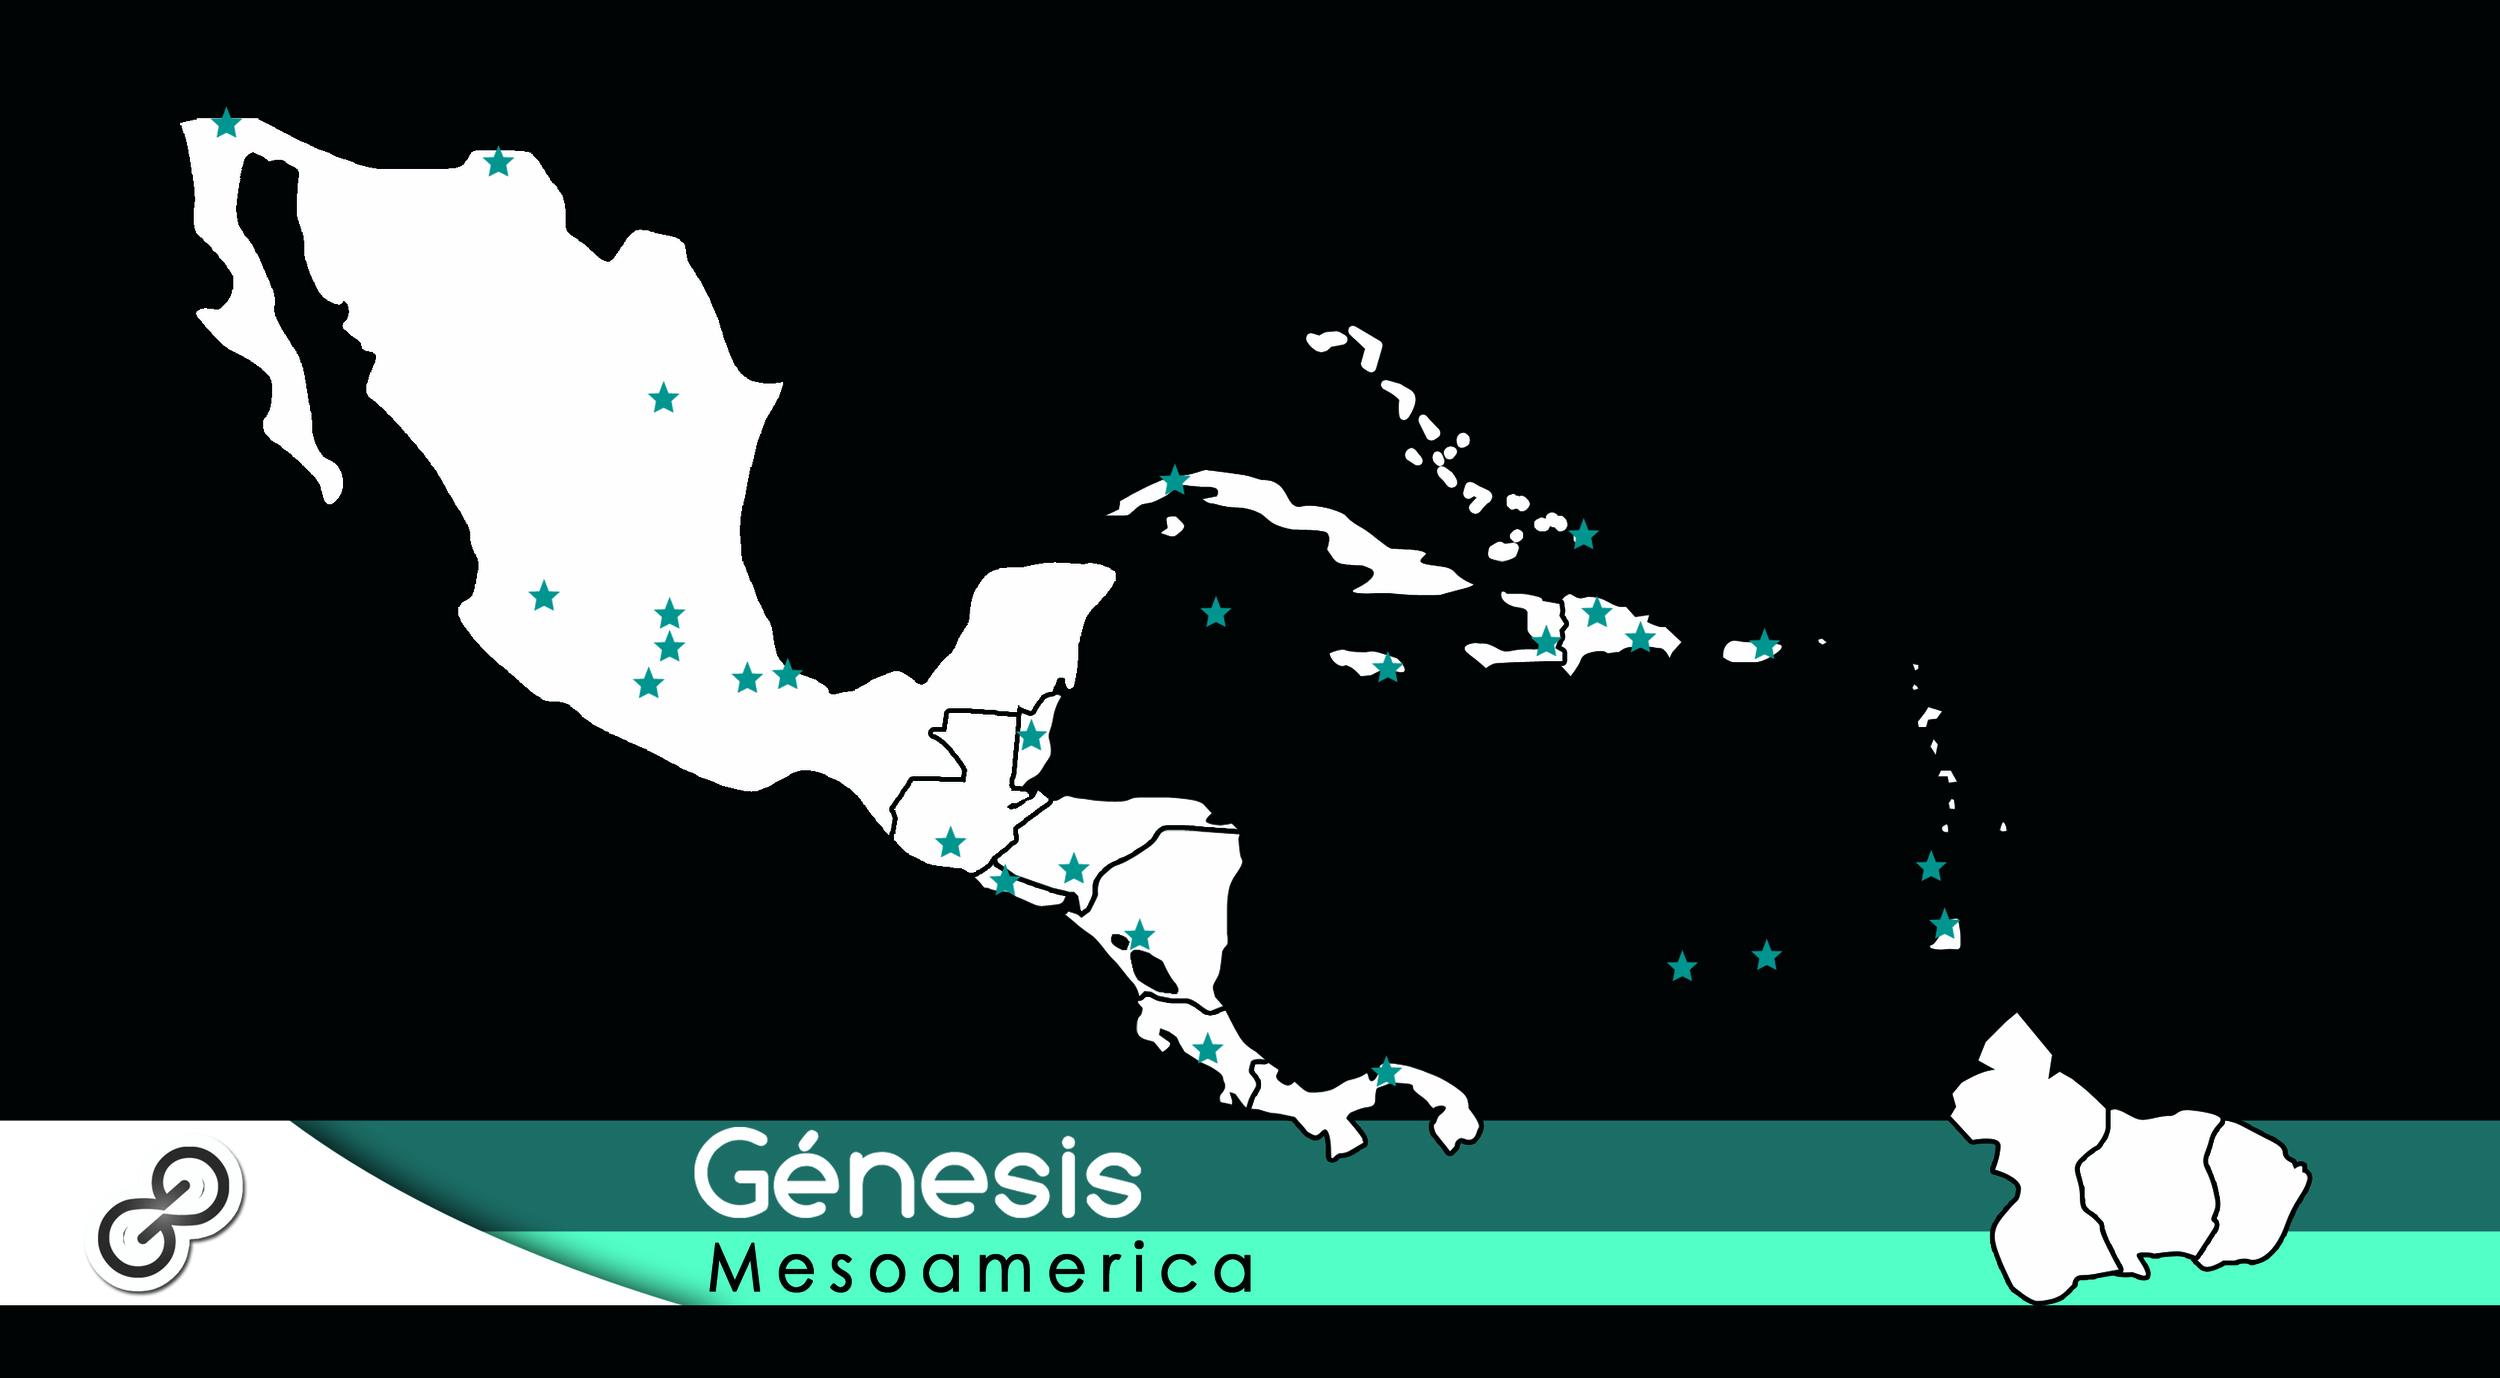 Genesis Site Map